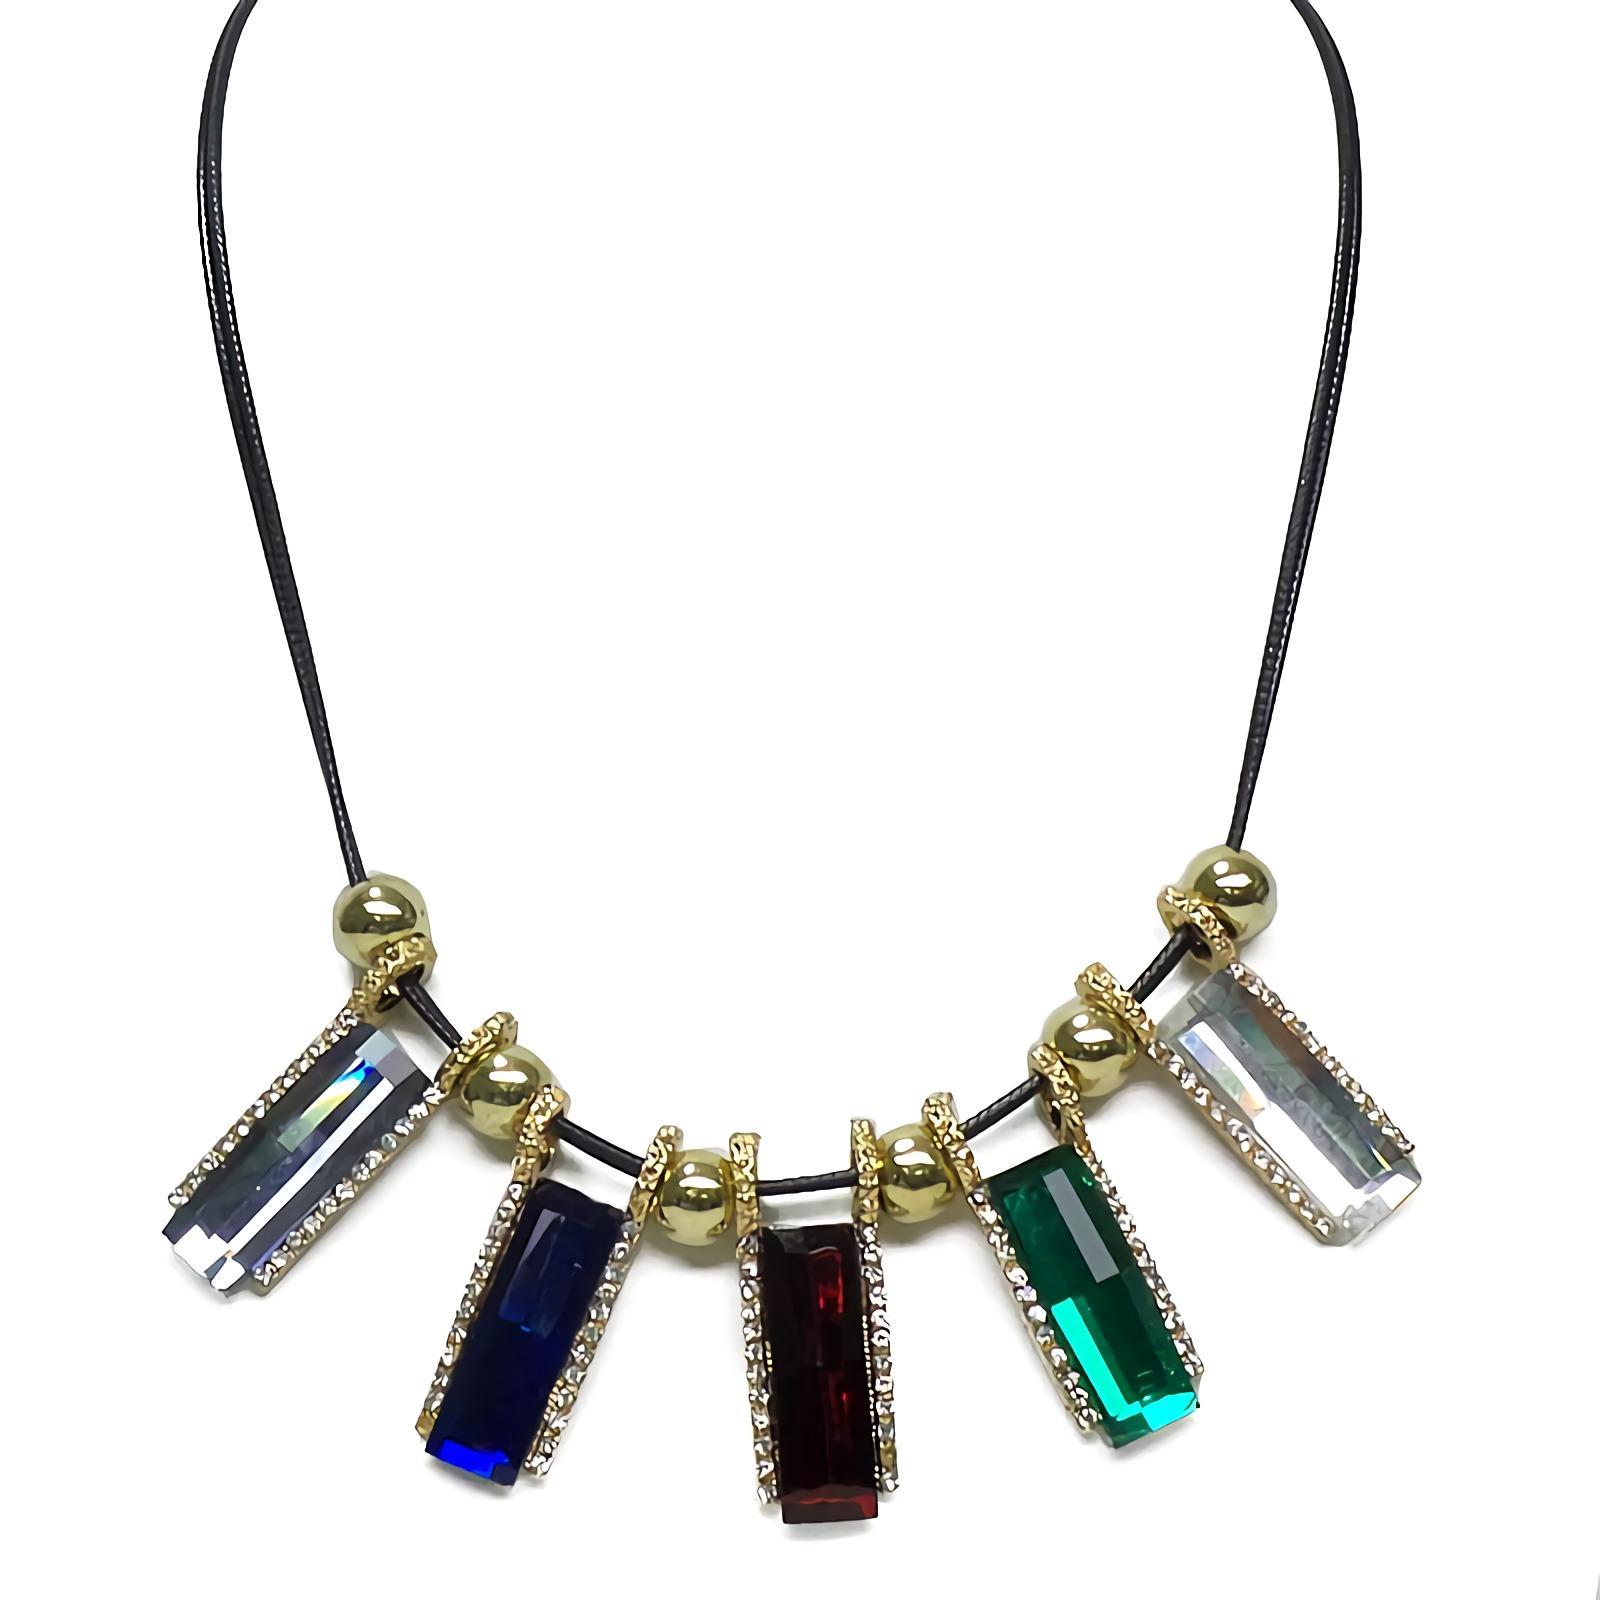 OFASHION Aksesoris Kalung CA-180314-K015 Necklace Fashion Xuping Jewelry Hitam Warni